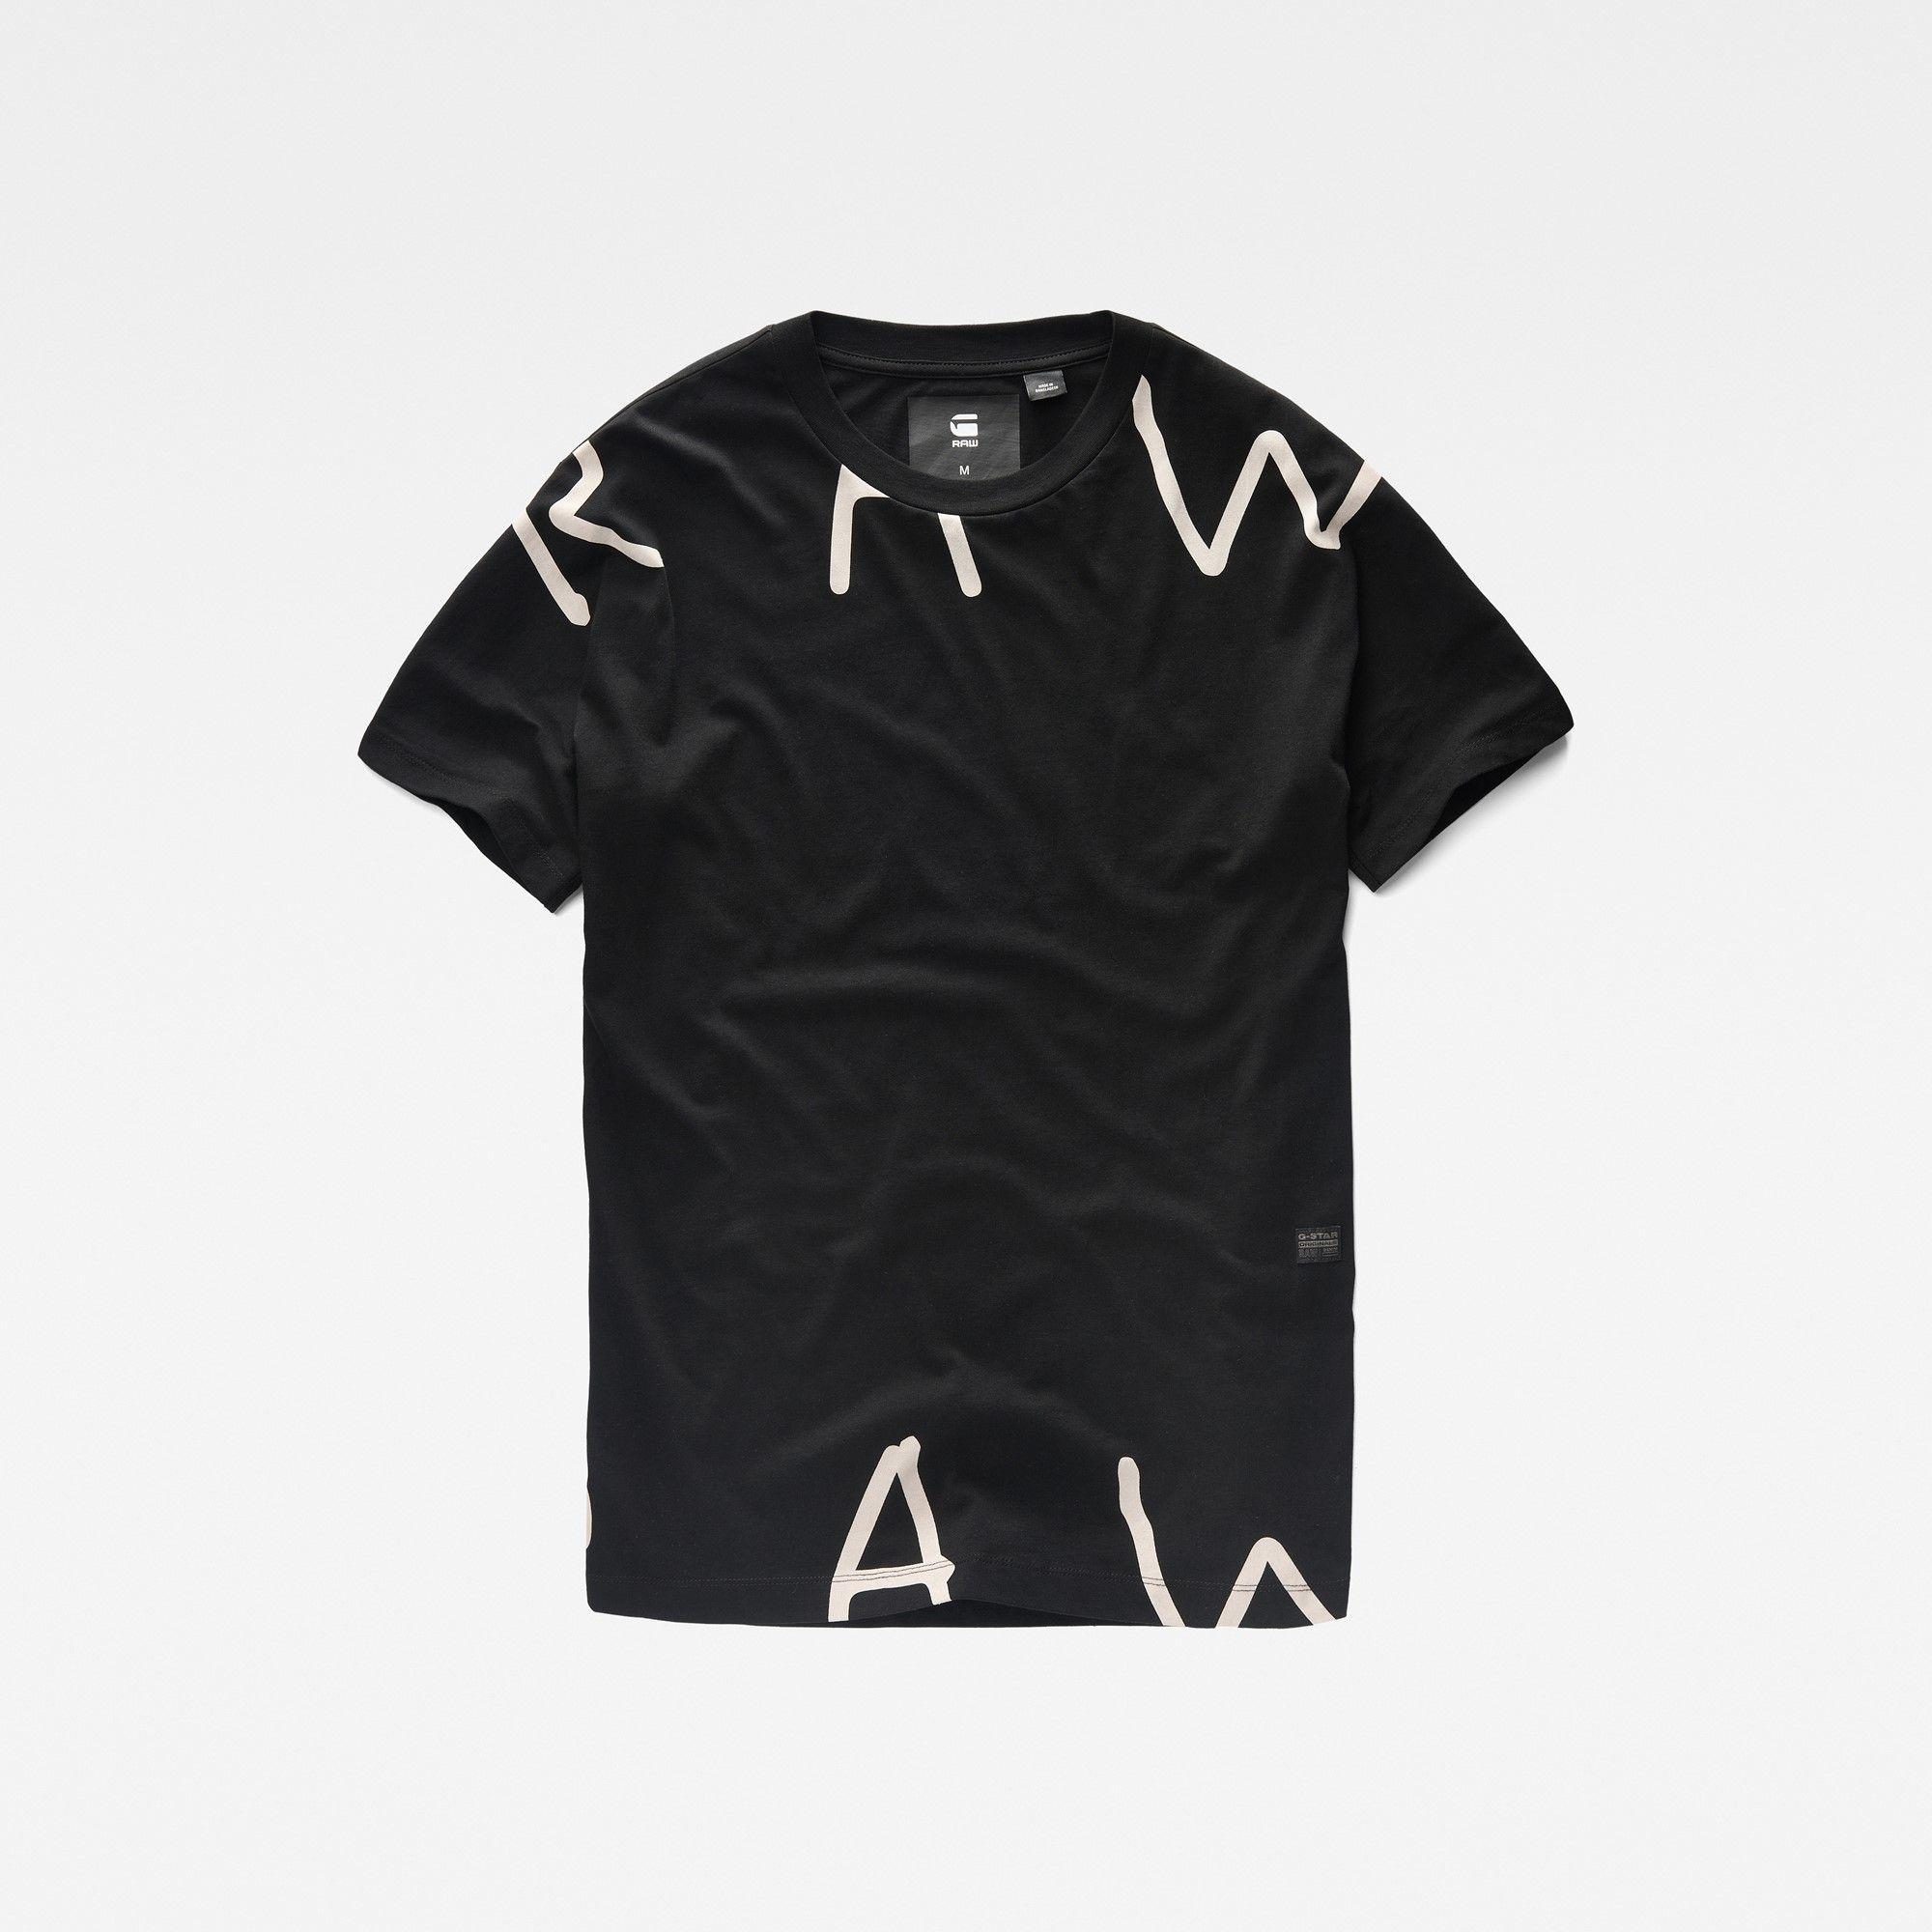 39bcb08a34 Dystix Regular Fit T-Shirt Raw Clothing, Gstar, Denim Branding, G Star